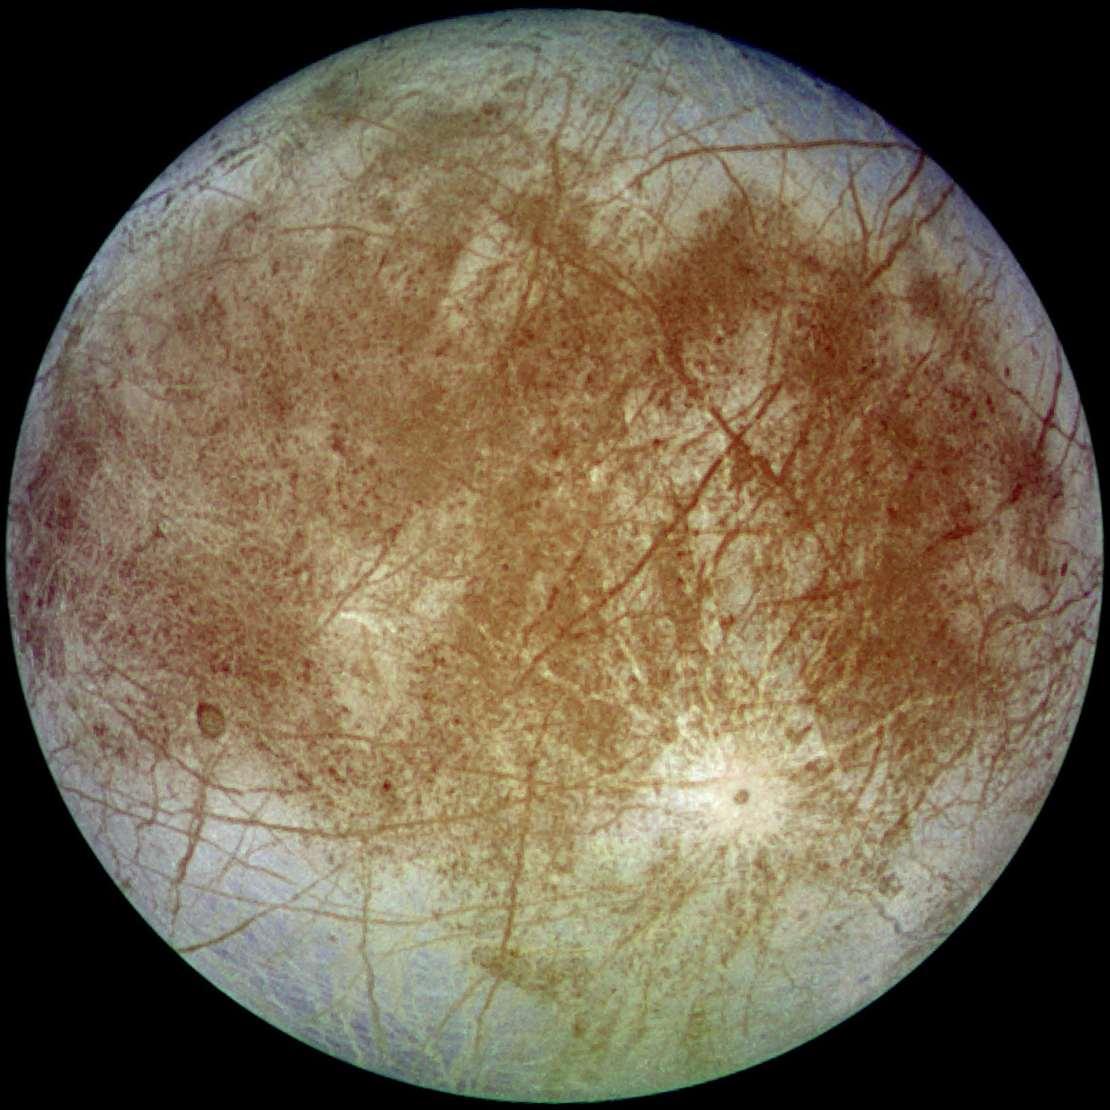 Image of Jupiter's moon Europa.